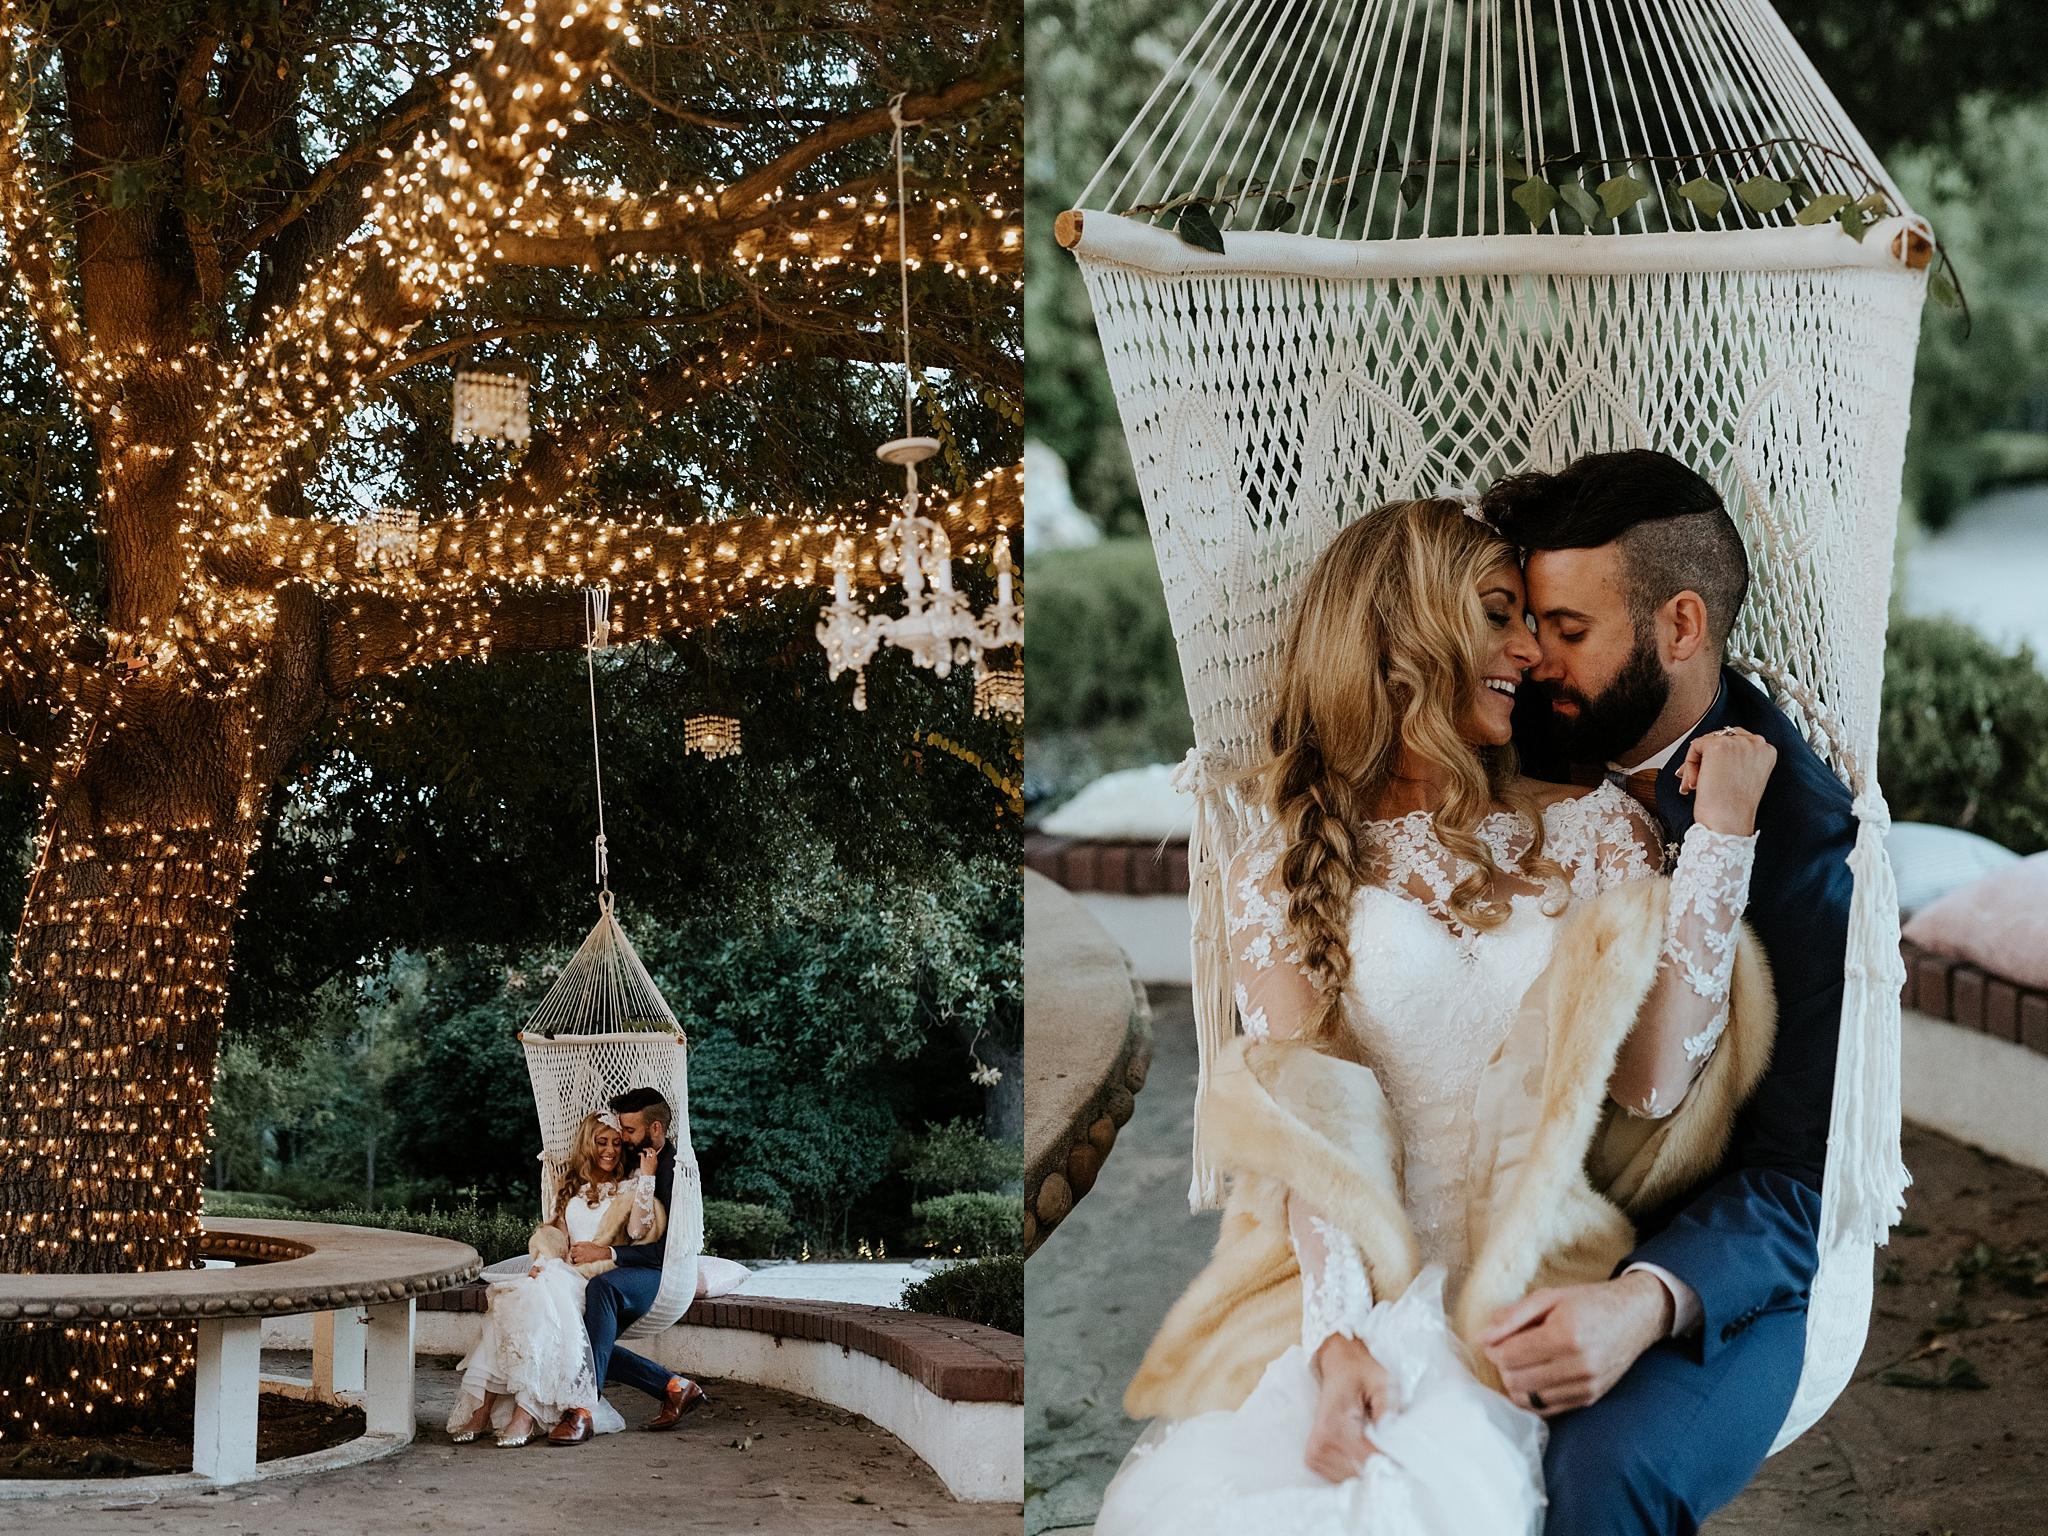 Bohemian Orcutt Ranch Wedding in Los Angeles California  - Los Angeles Californai Wedding Photographer_0049.jpg